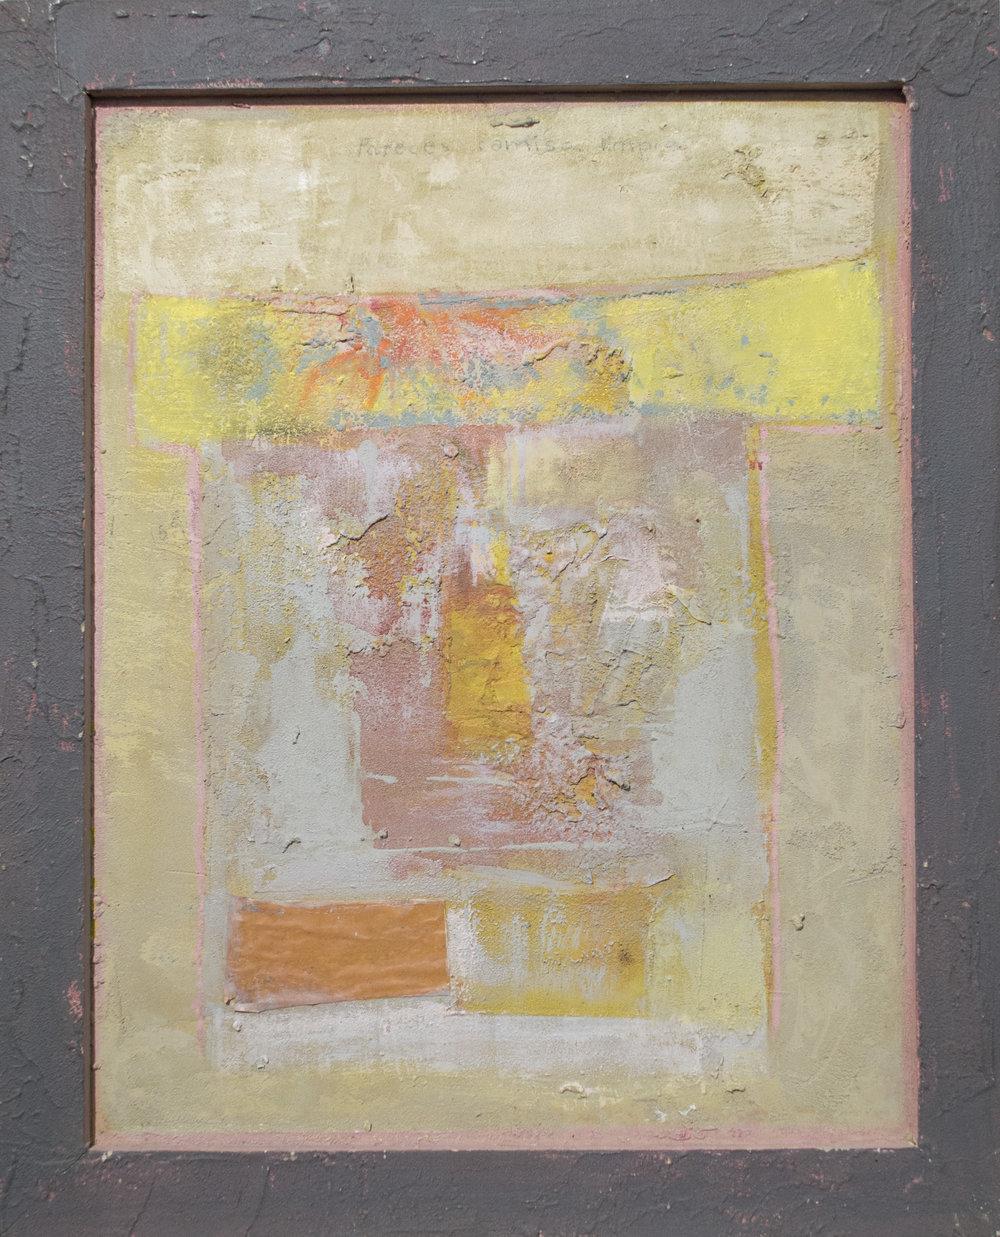 Alberto Mijangos - 1990, oil on panel and frame, 20